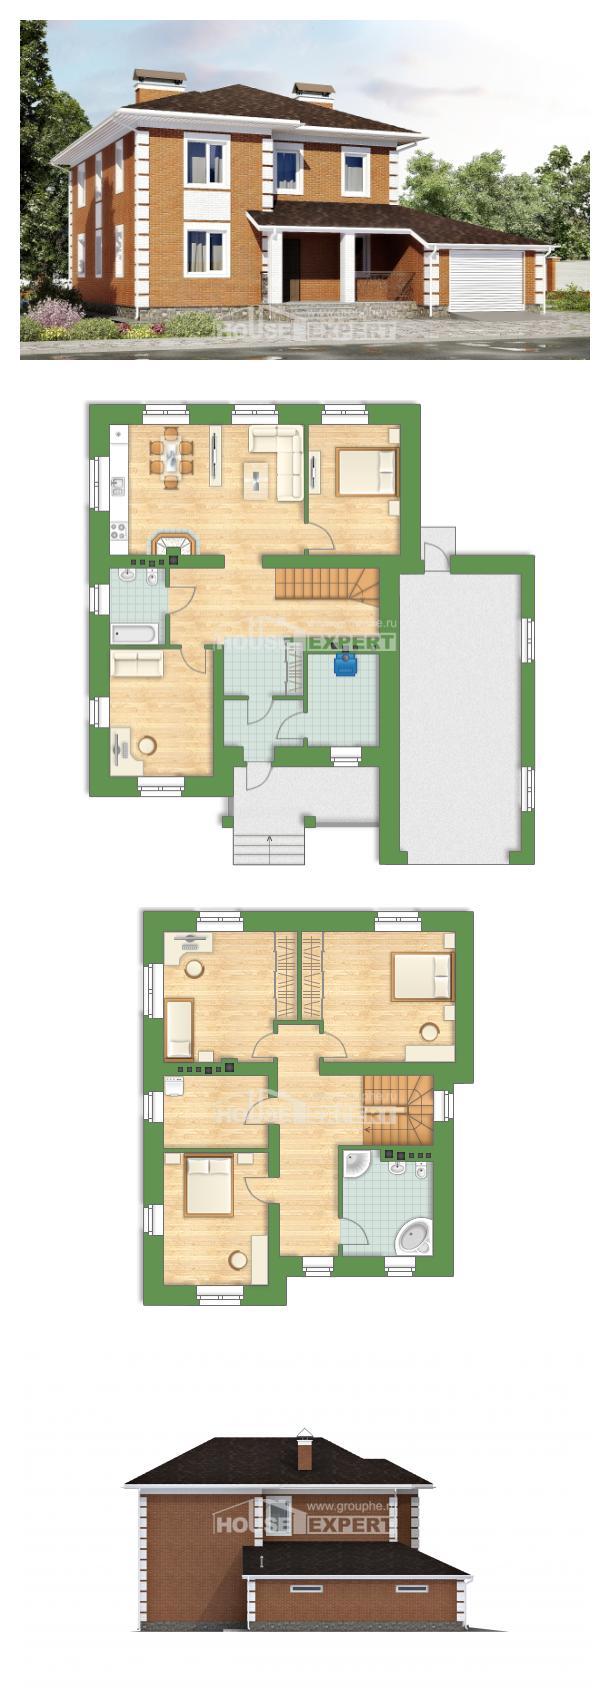 Проект дома 220-004-Л | House Expert